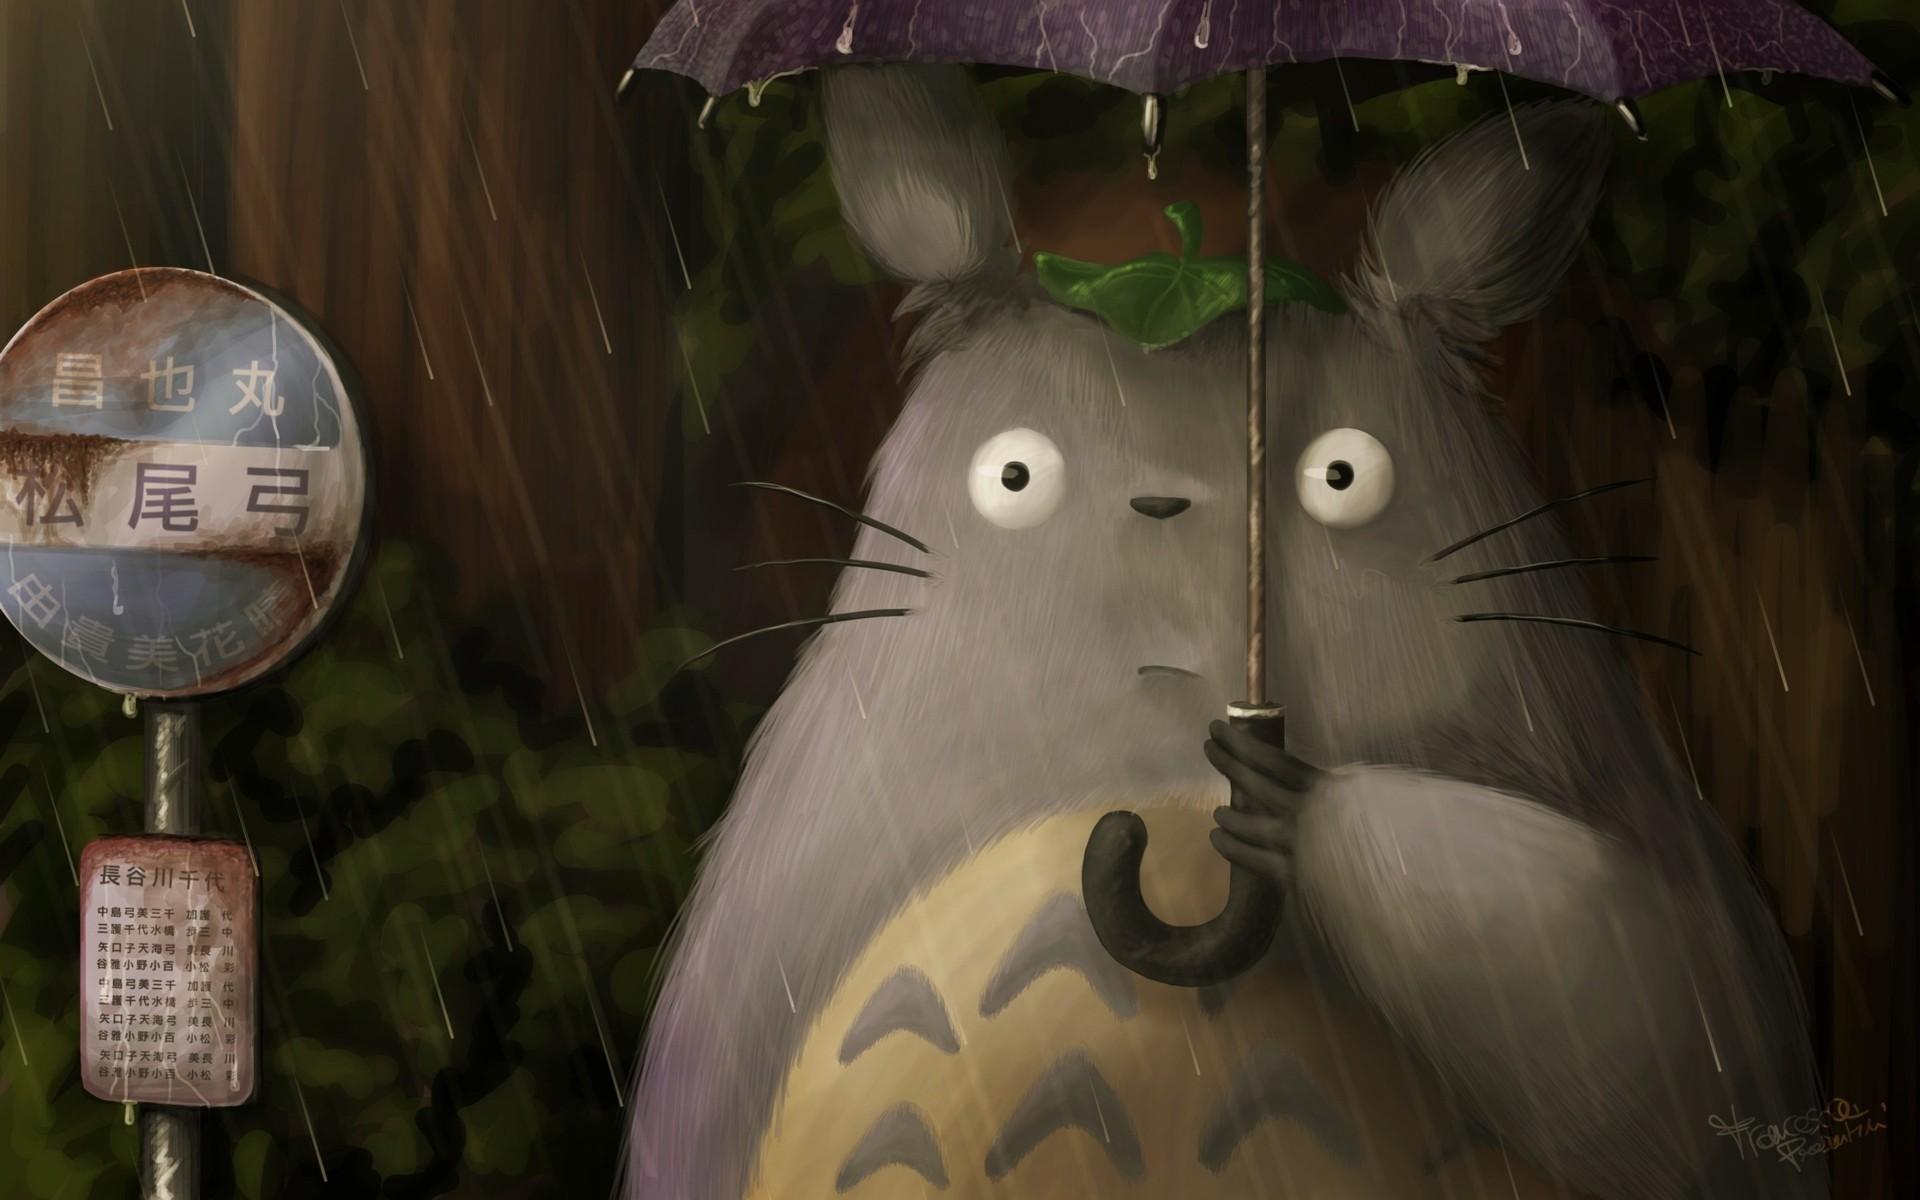 My Neighbor Totoro wallpaper ·① Download free beautiful ...